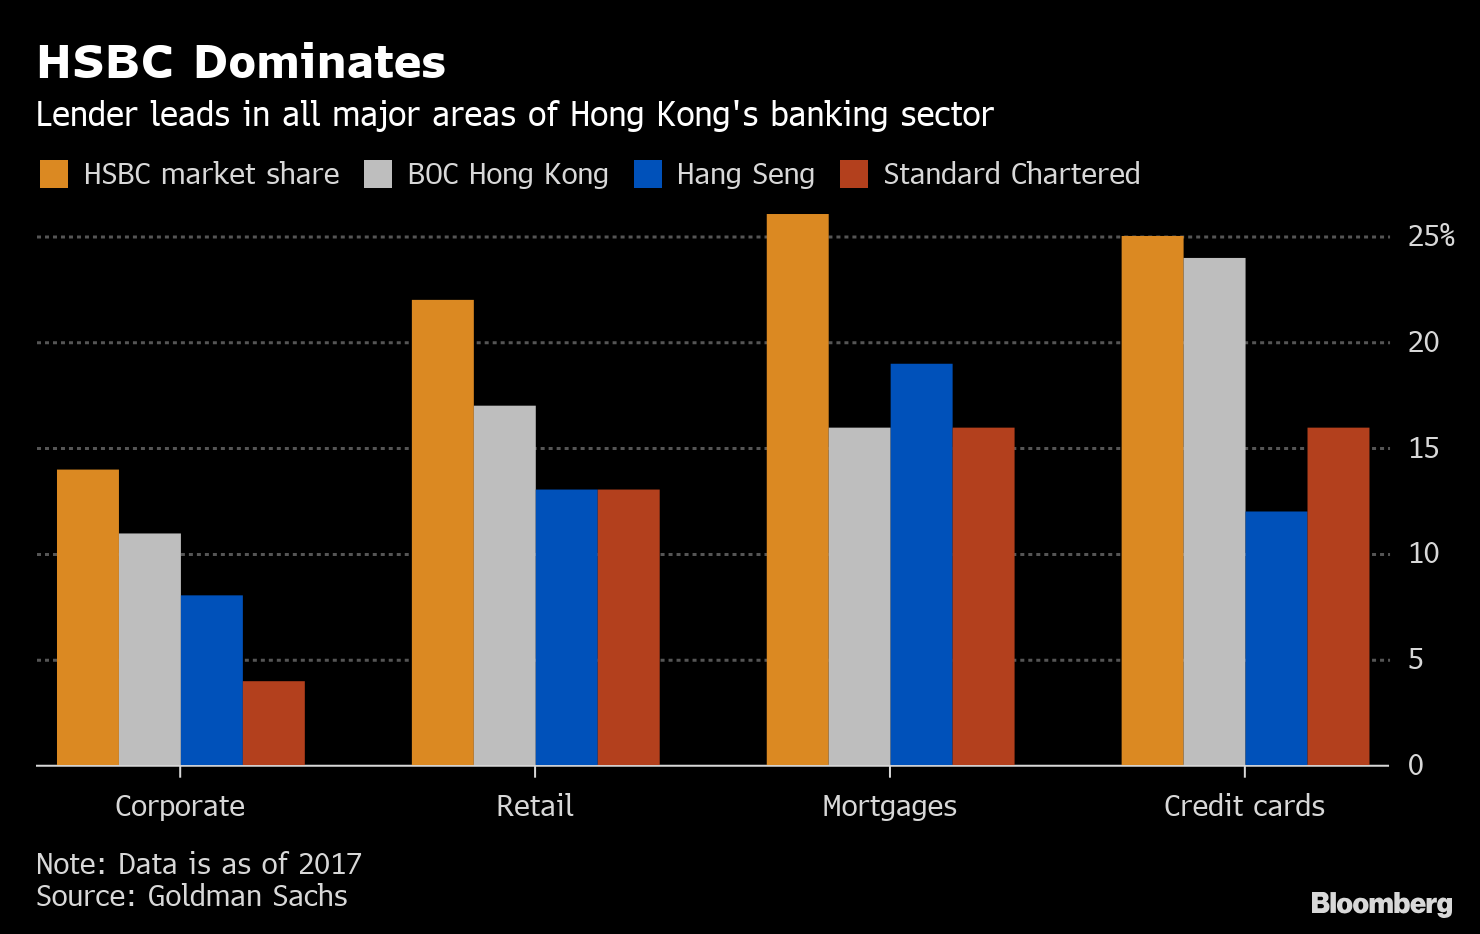 HSBC's Dominance in Hong Kong Is Juicy Target for Virtual Banks